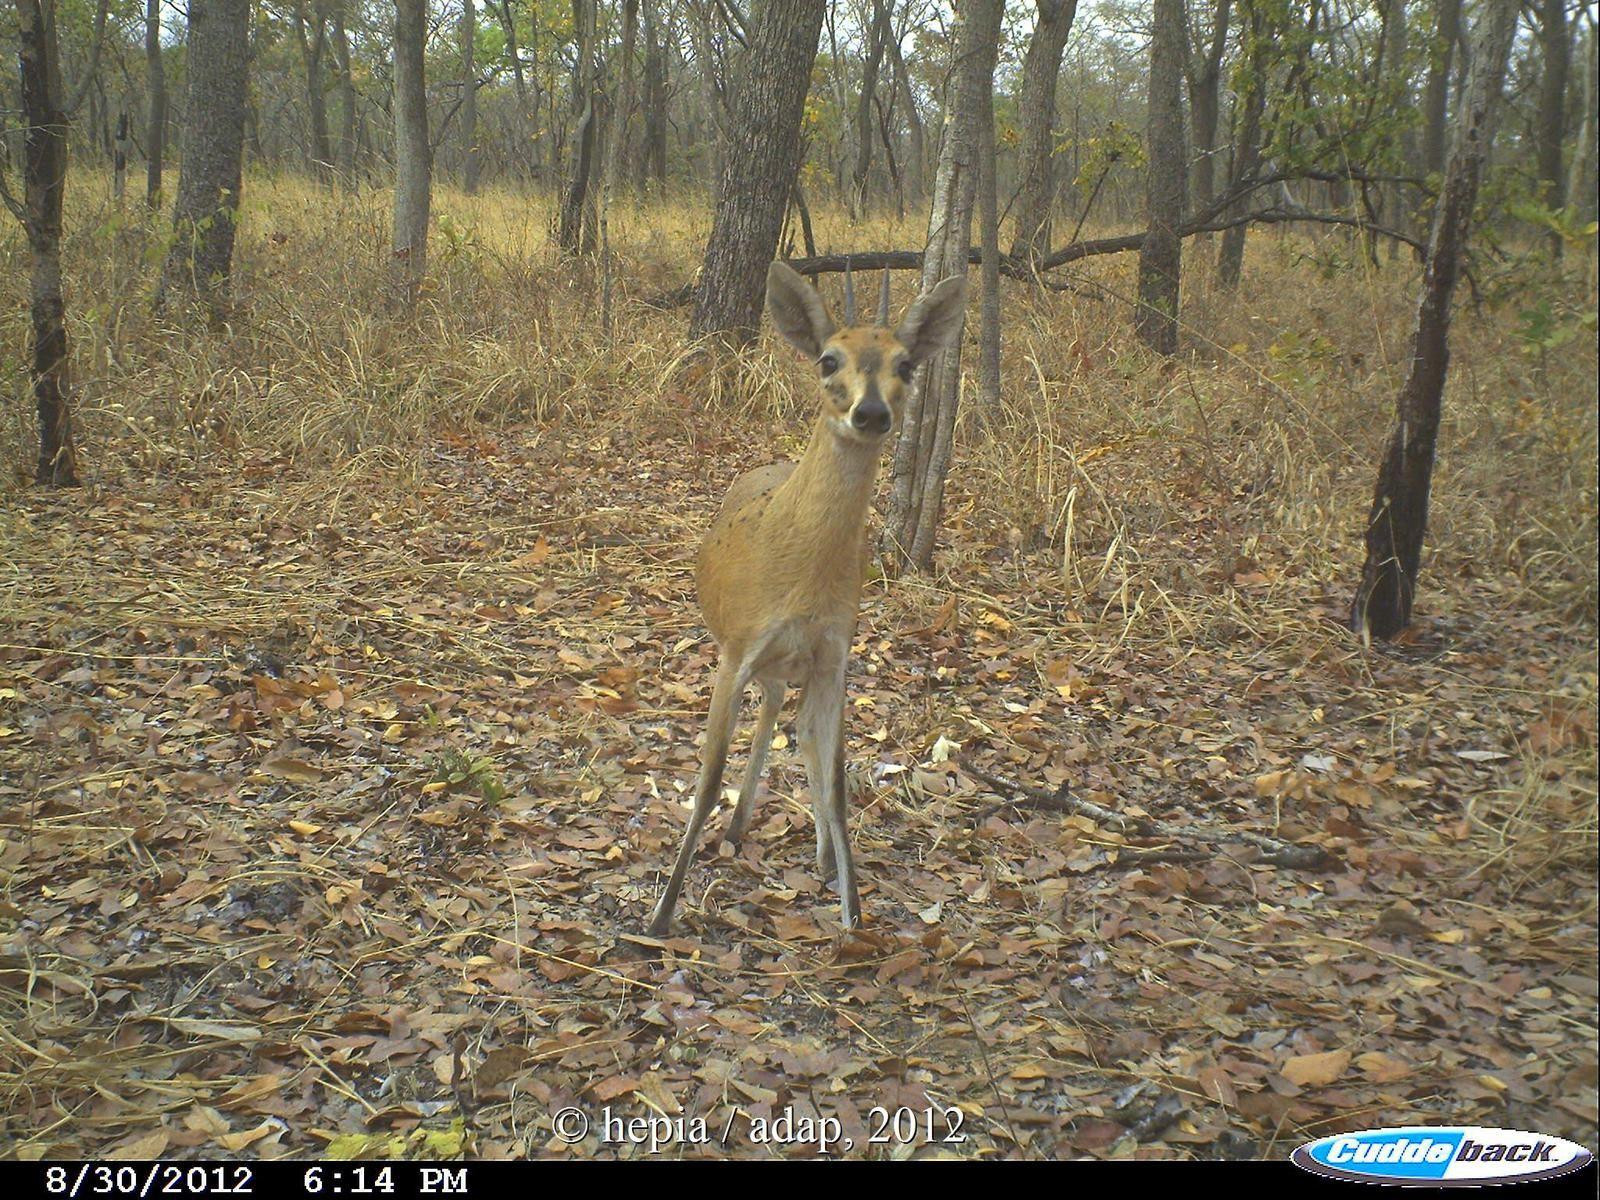 Bushbuck (Tragelaphus scritus), hyena (Crocuta crocuta) and common duiker (Sylvicapra grimmia)